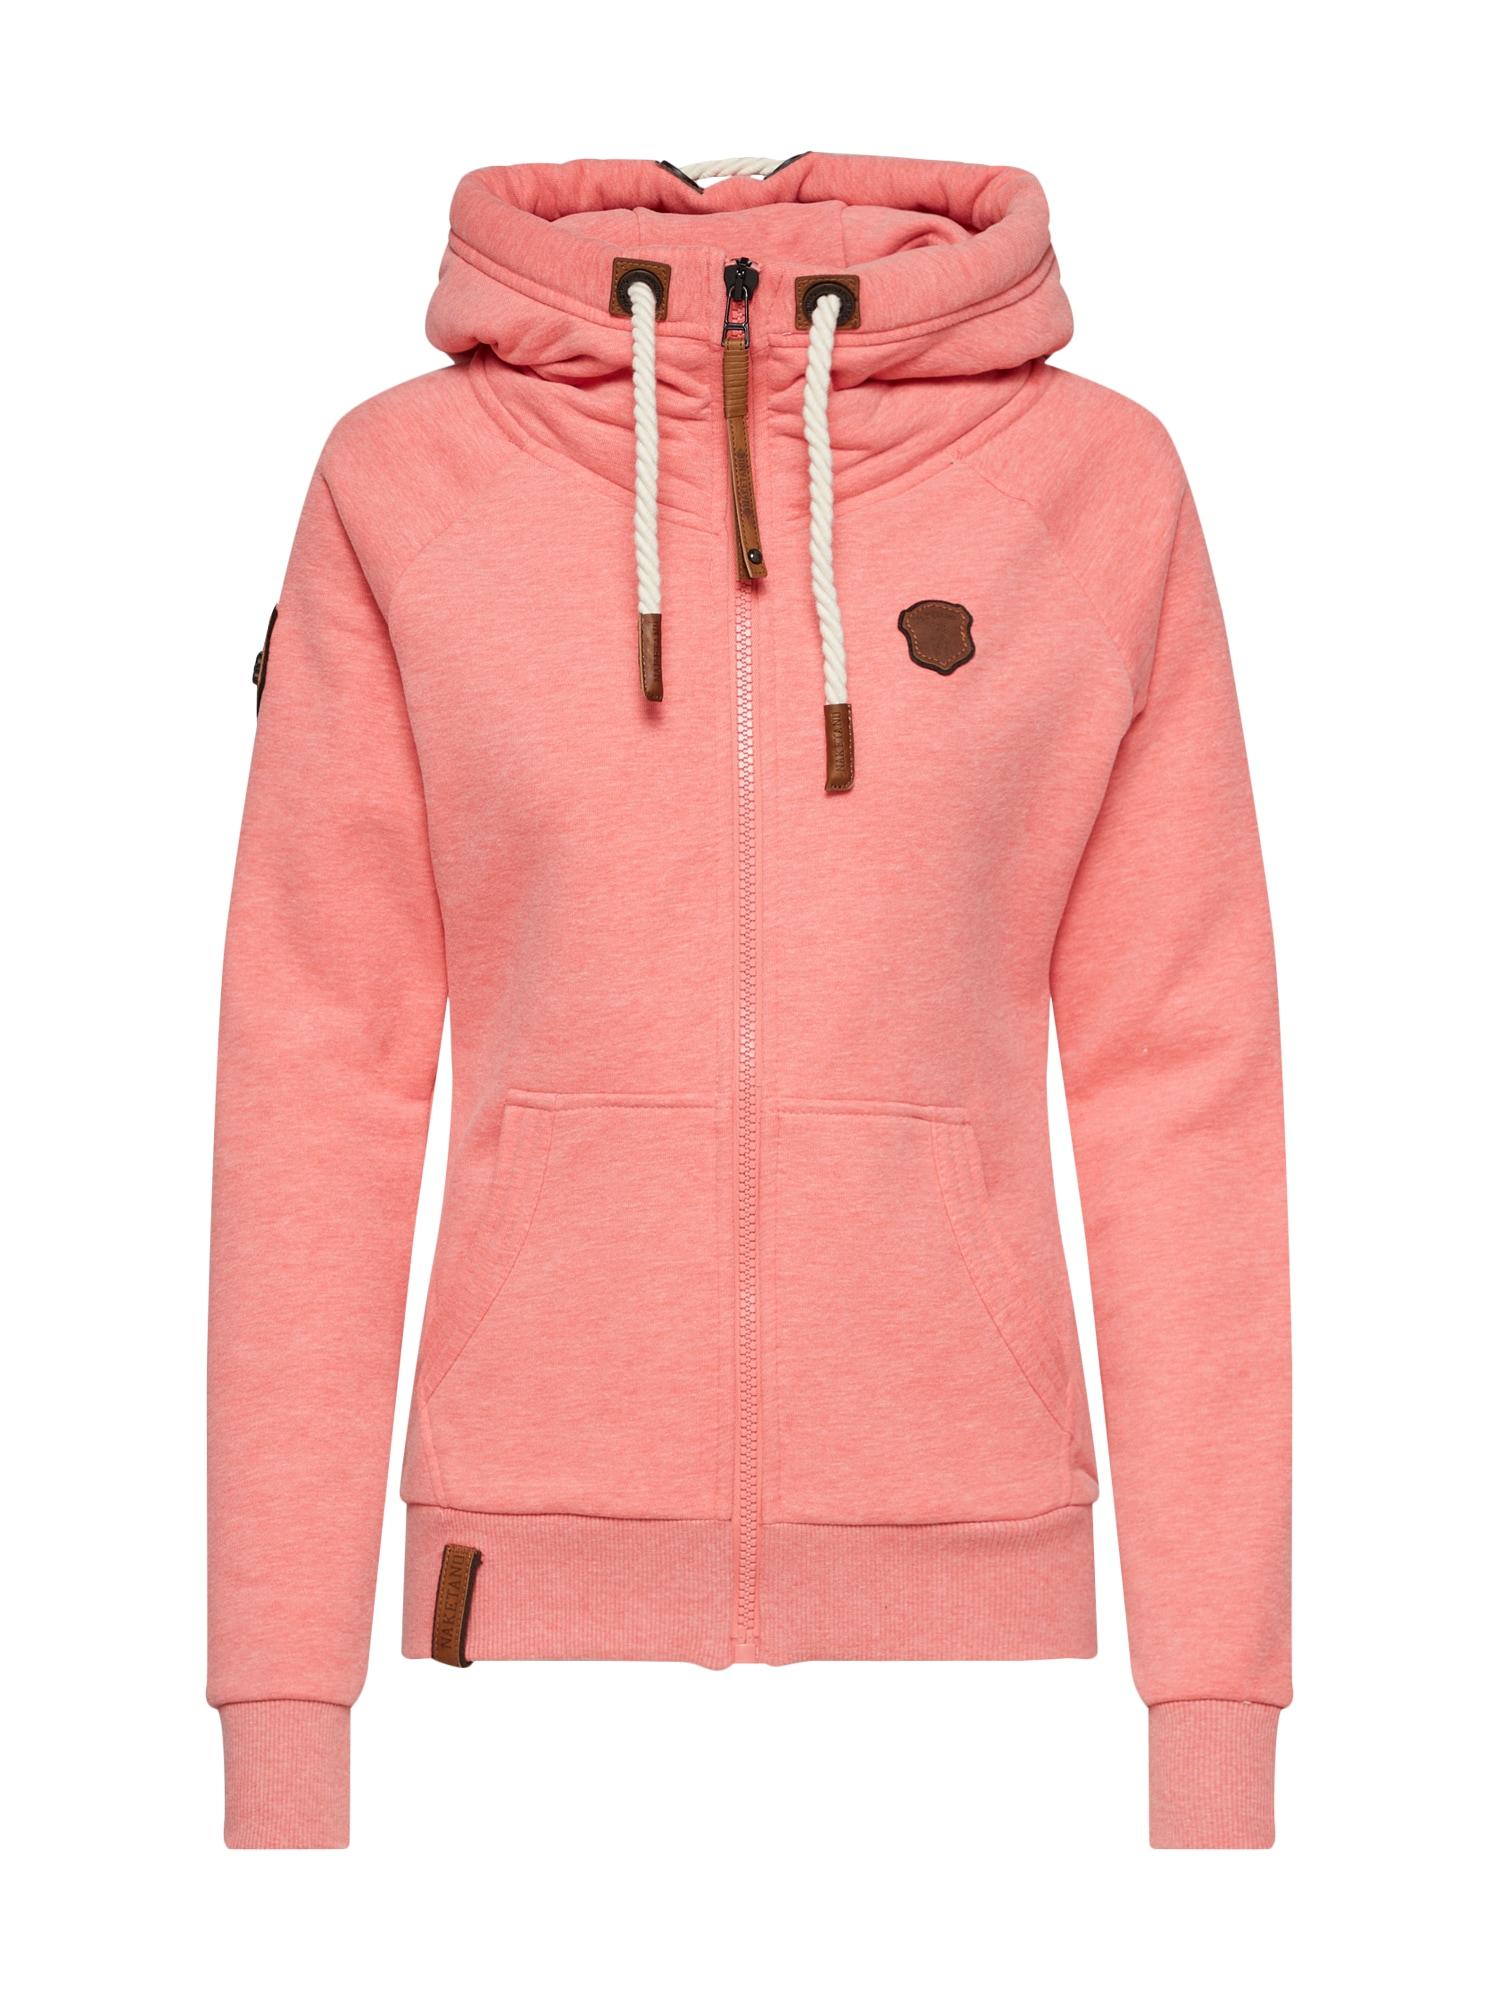 Mikina s kapucí Brazzo pink Naketano